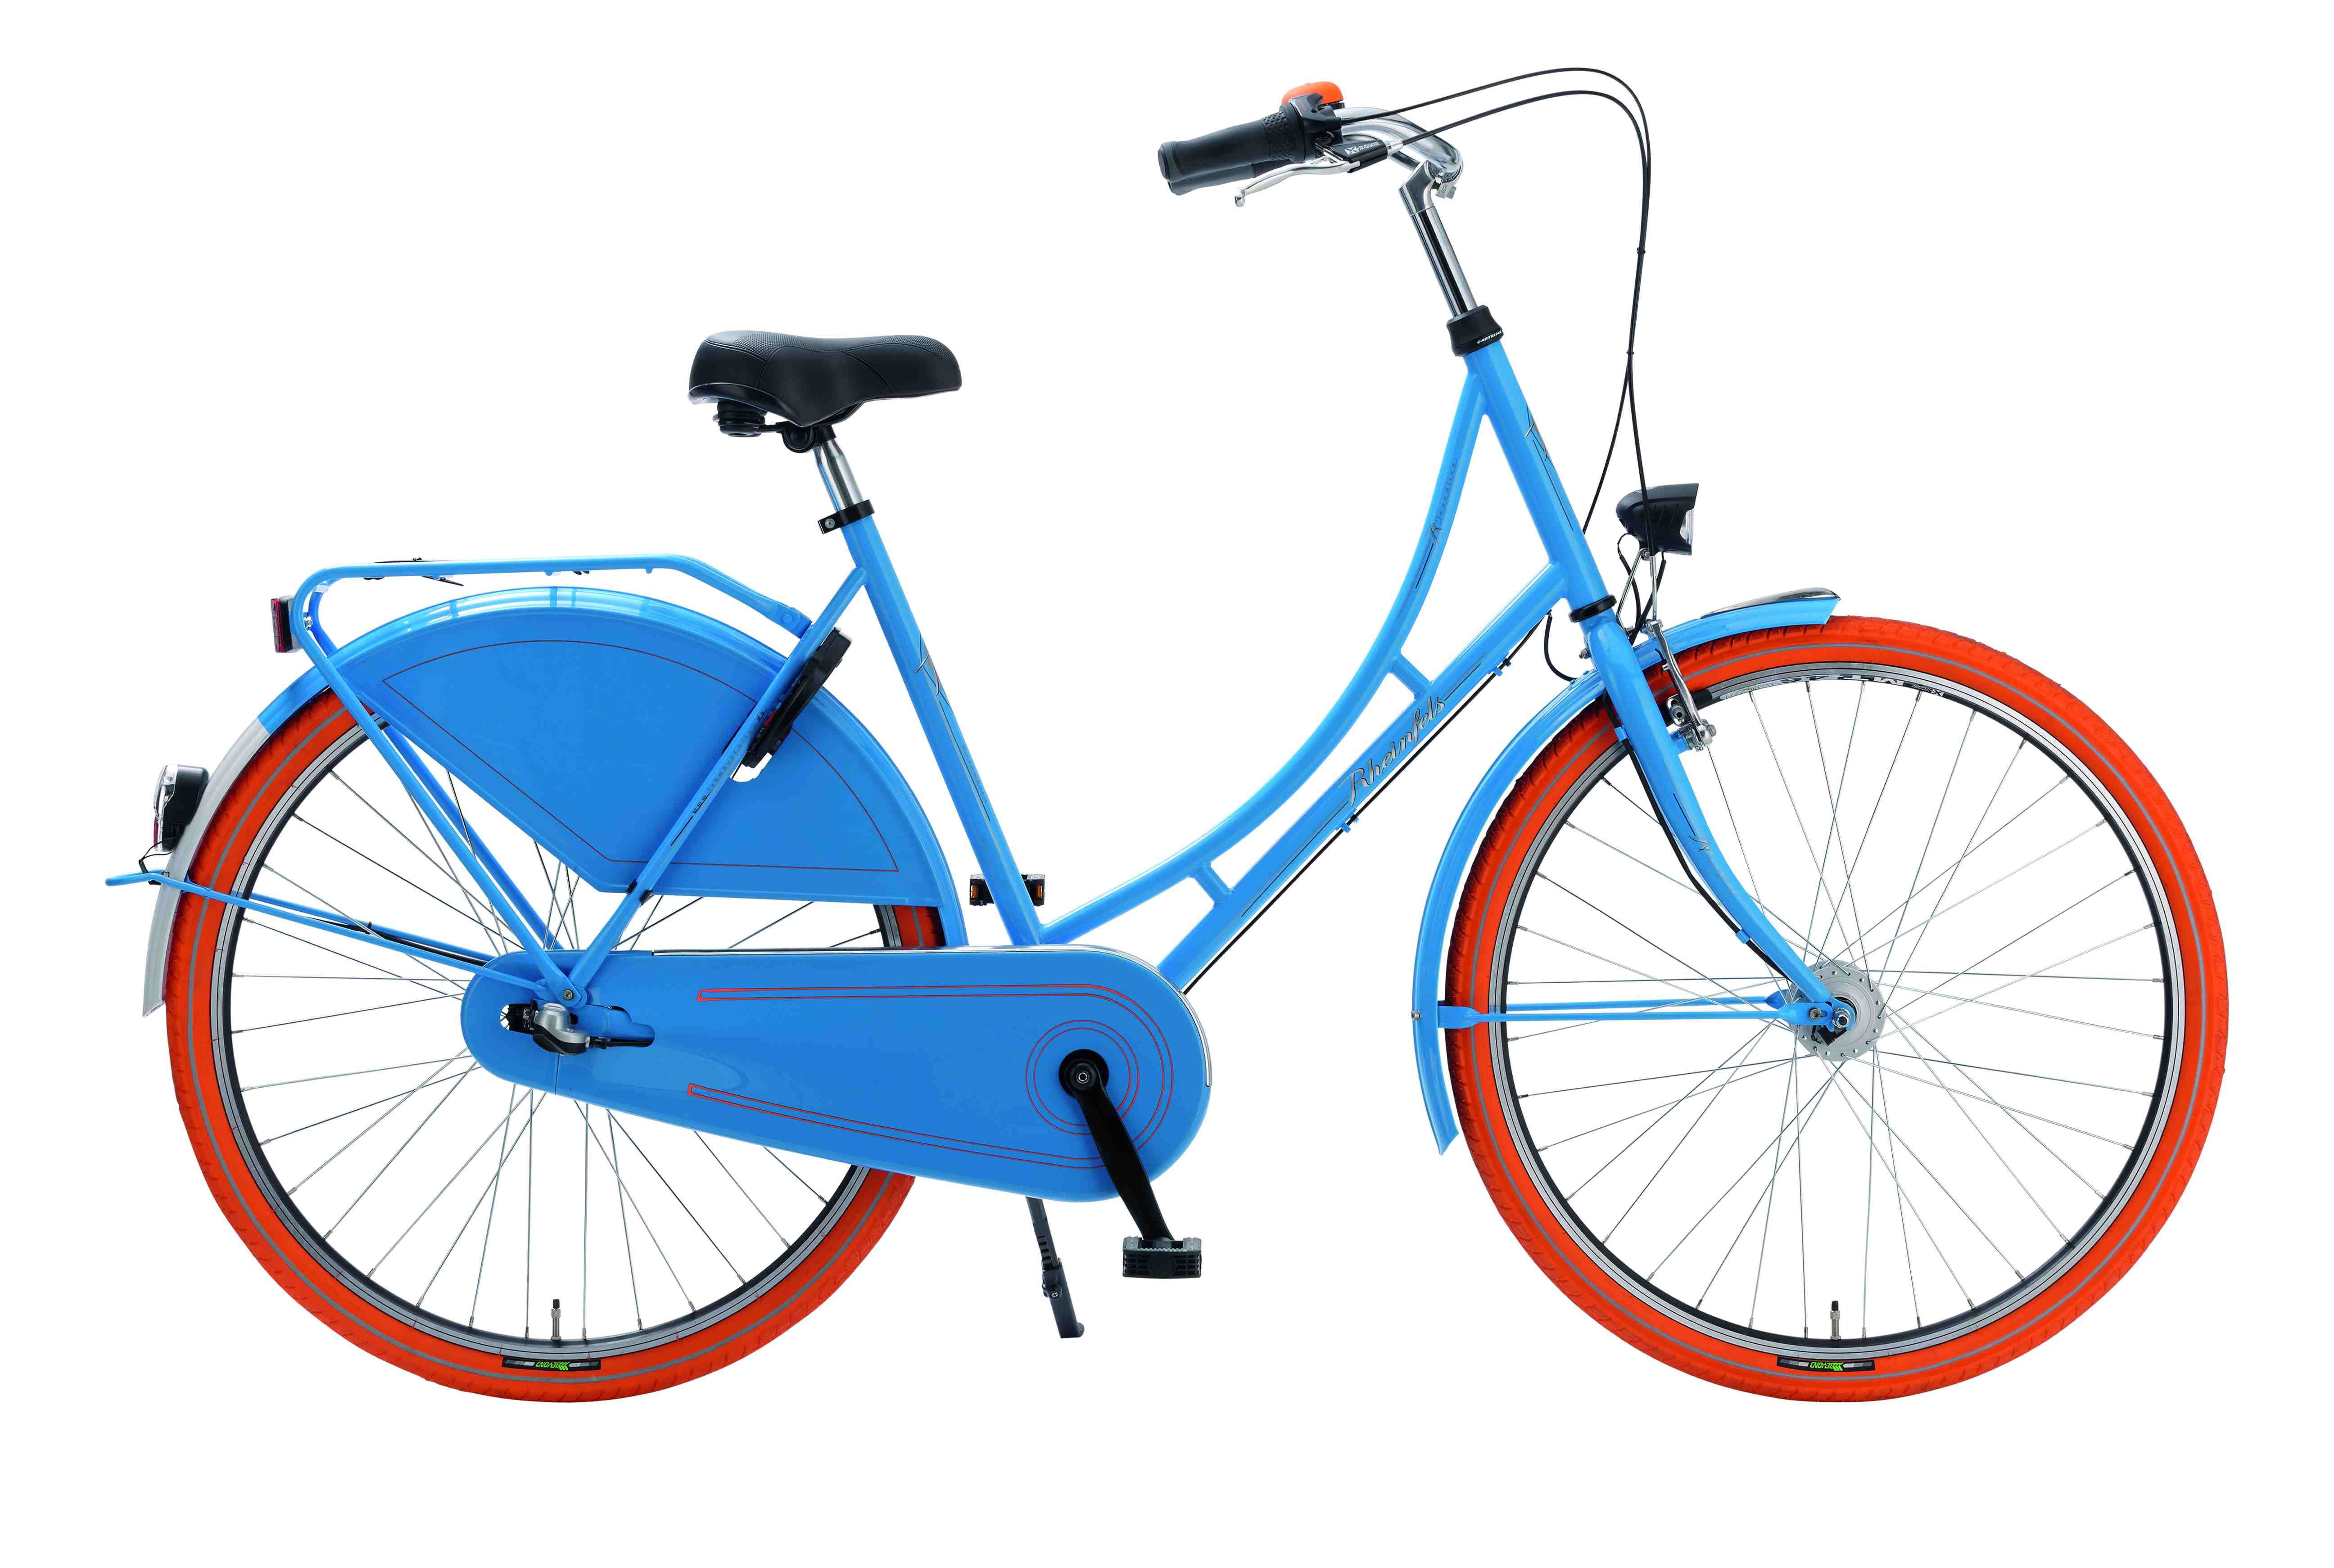 das hollandrad kultiges fahrrad f r stadt und land der. Black Bedroom Furniture Sets. Home Design Ideas